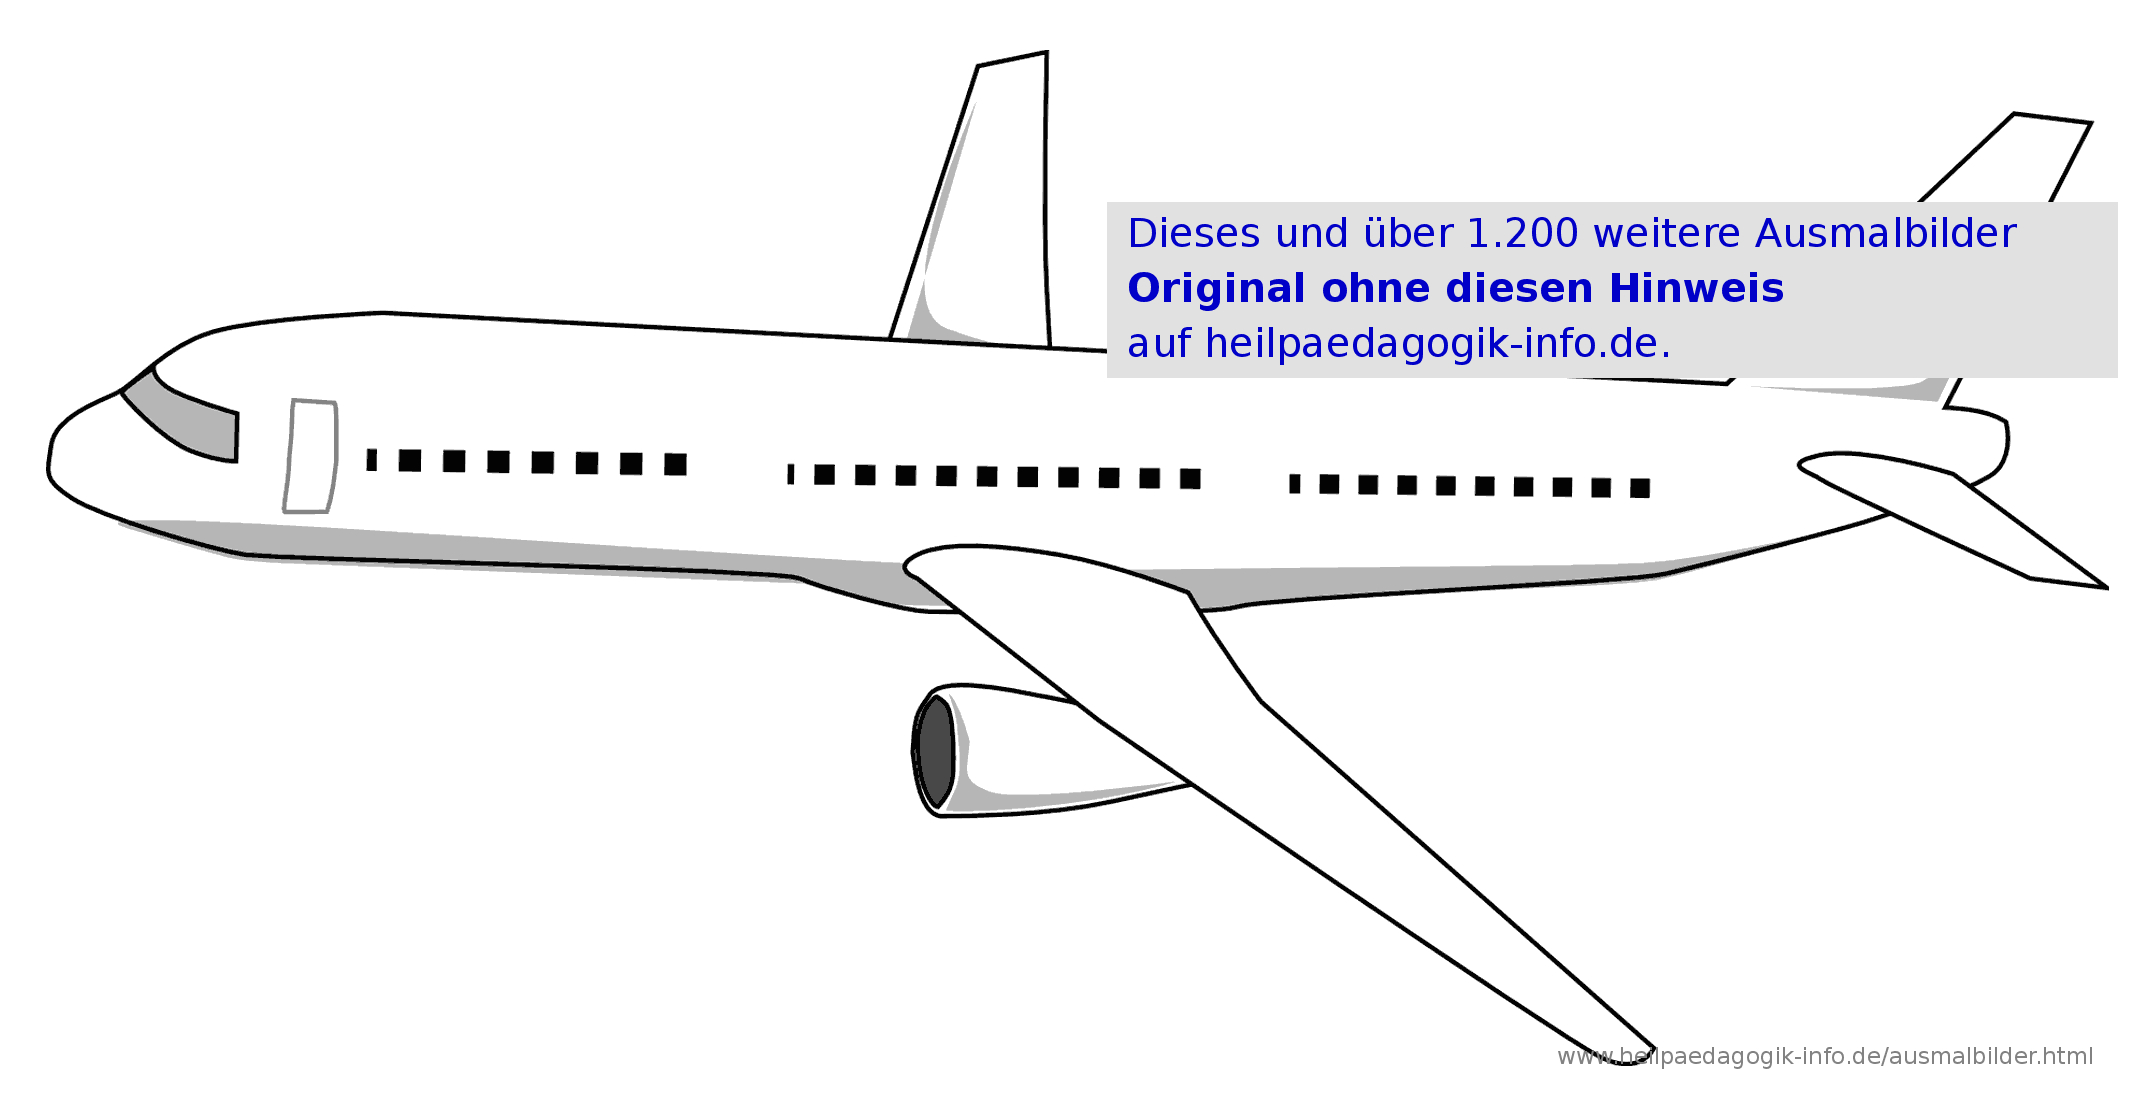 Ausmalbilder Flugzeuge innen Ausmalbild Flugzeug